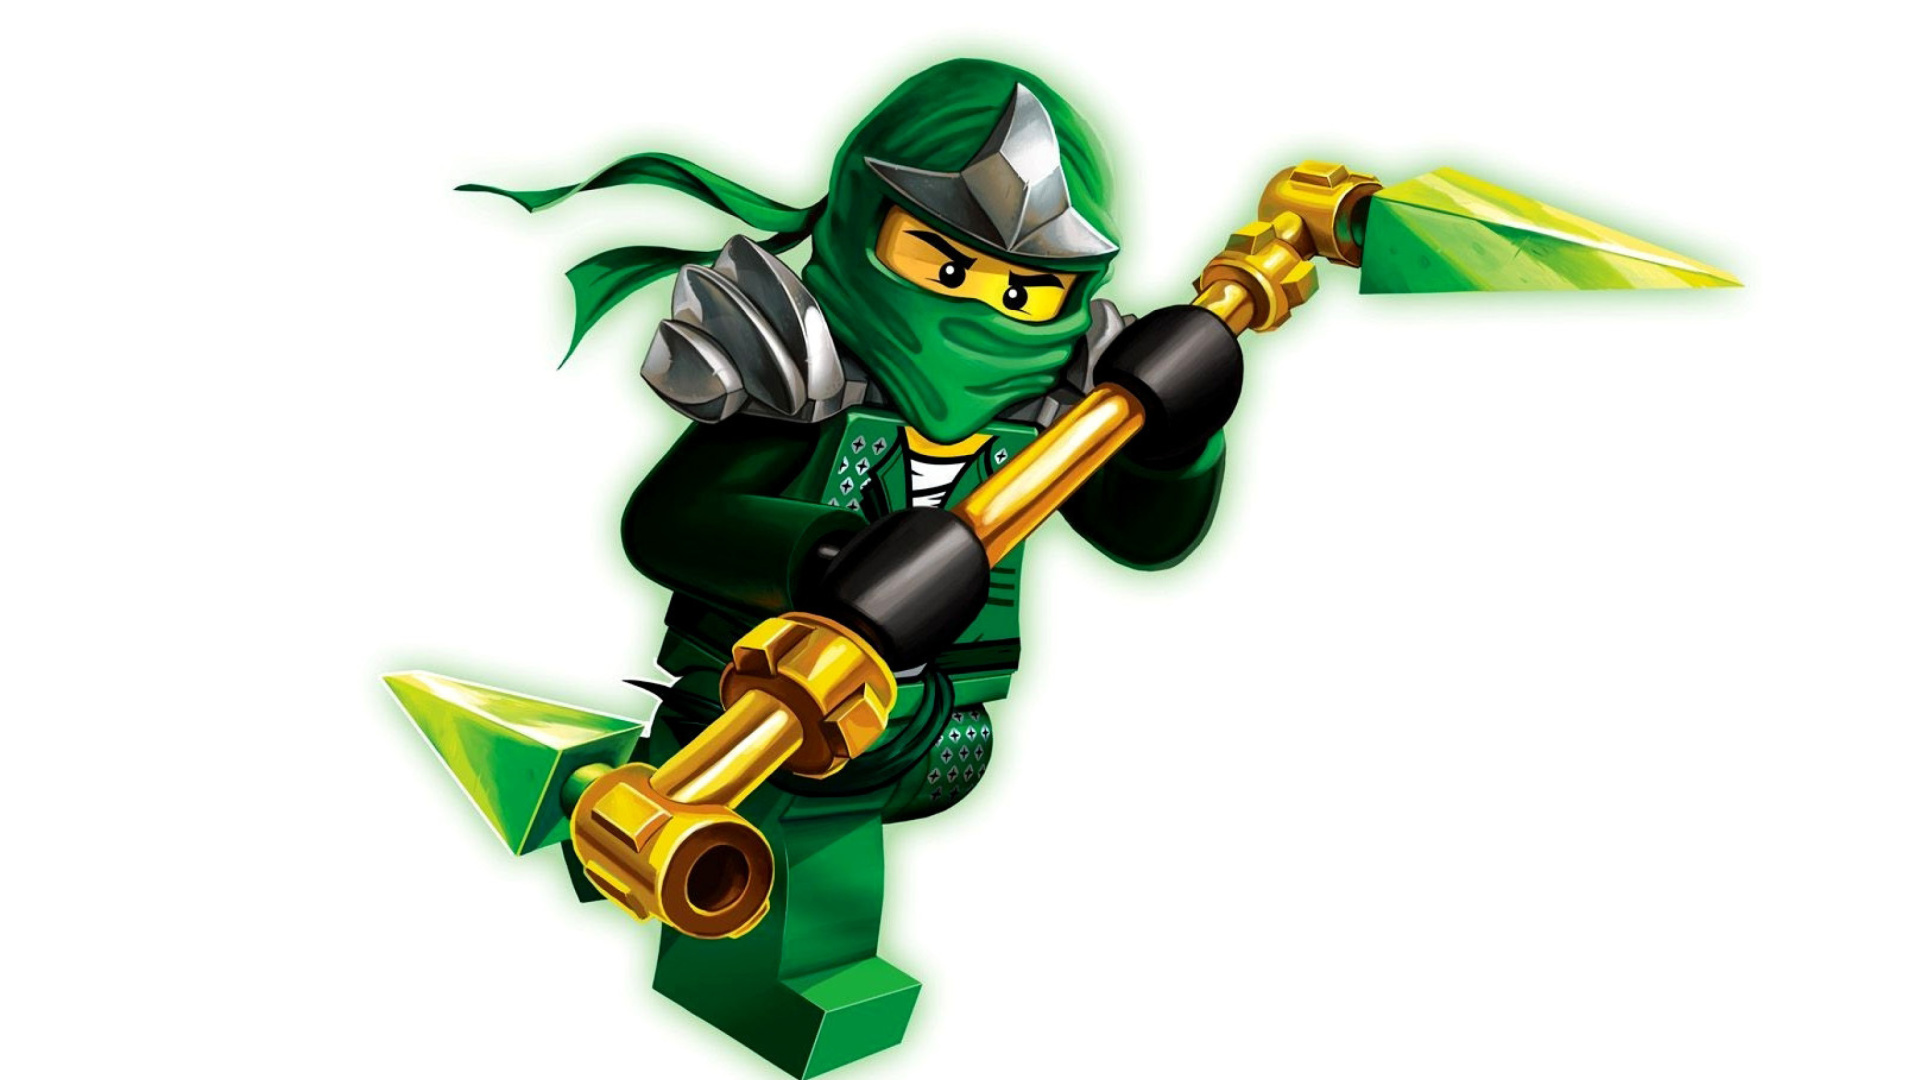 Ninjago clipart svg download Free LEGO Ninjago Cliparts, Download Free Clip Art, Free ... svg download